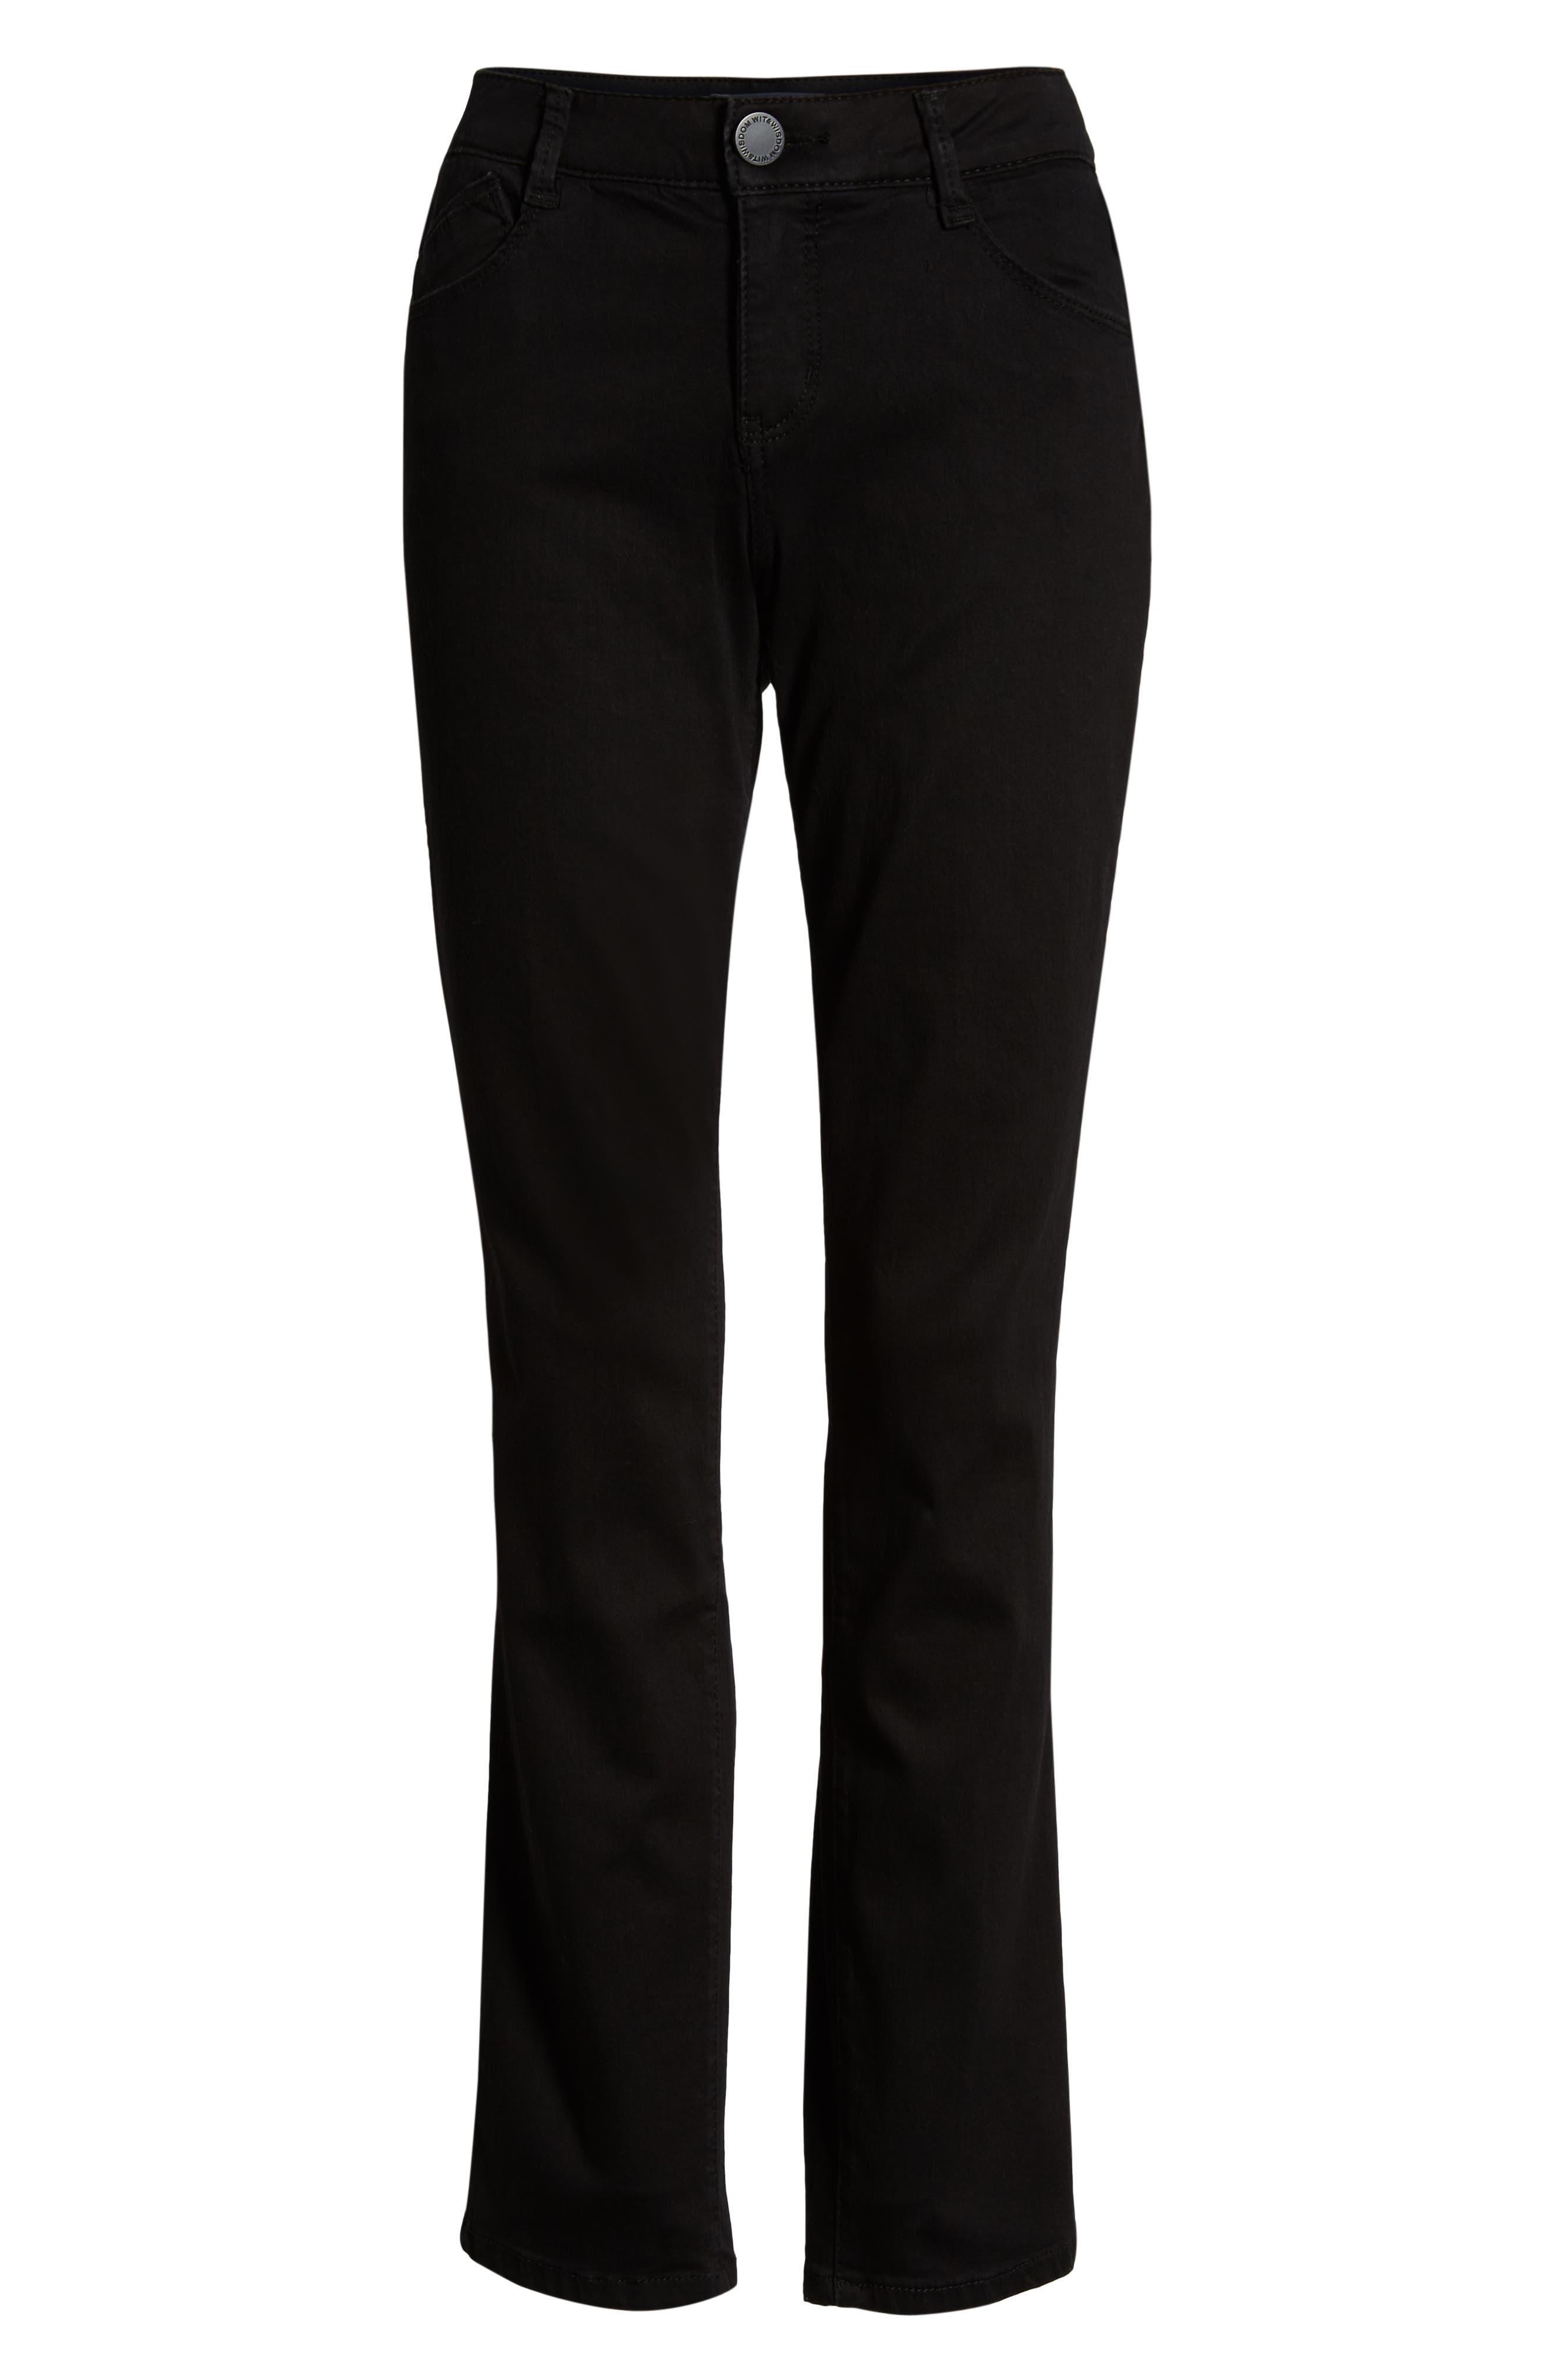 Ab-solution Straight Leg Jeans,                             Alternate thumbnail 7, color,                             BLACK